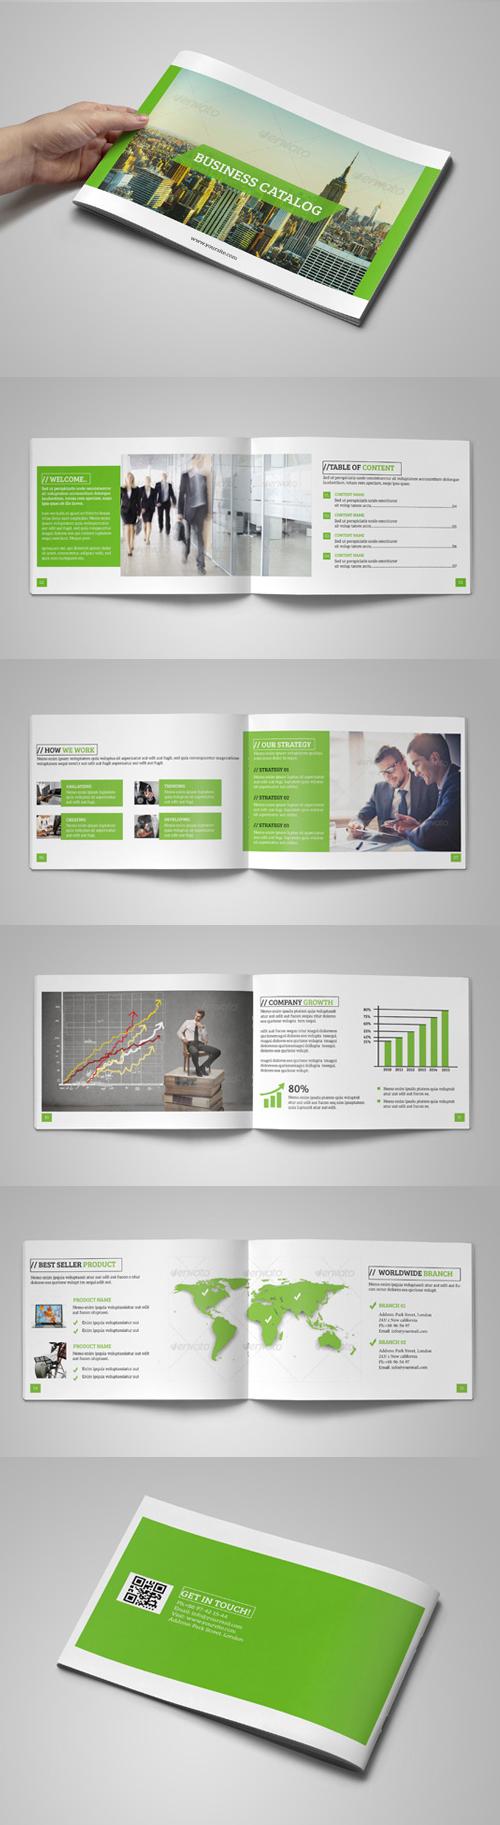 Business Catalog/ Brochure Template